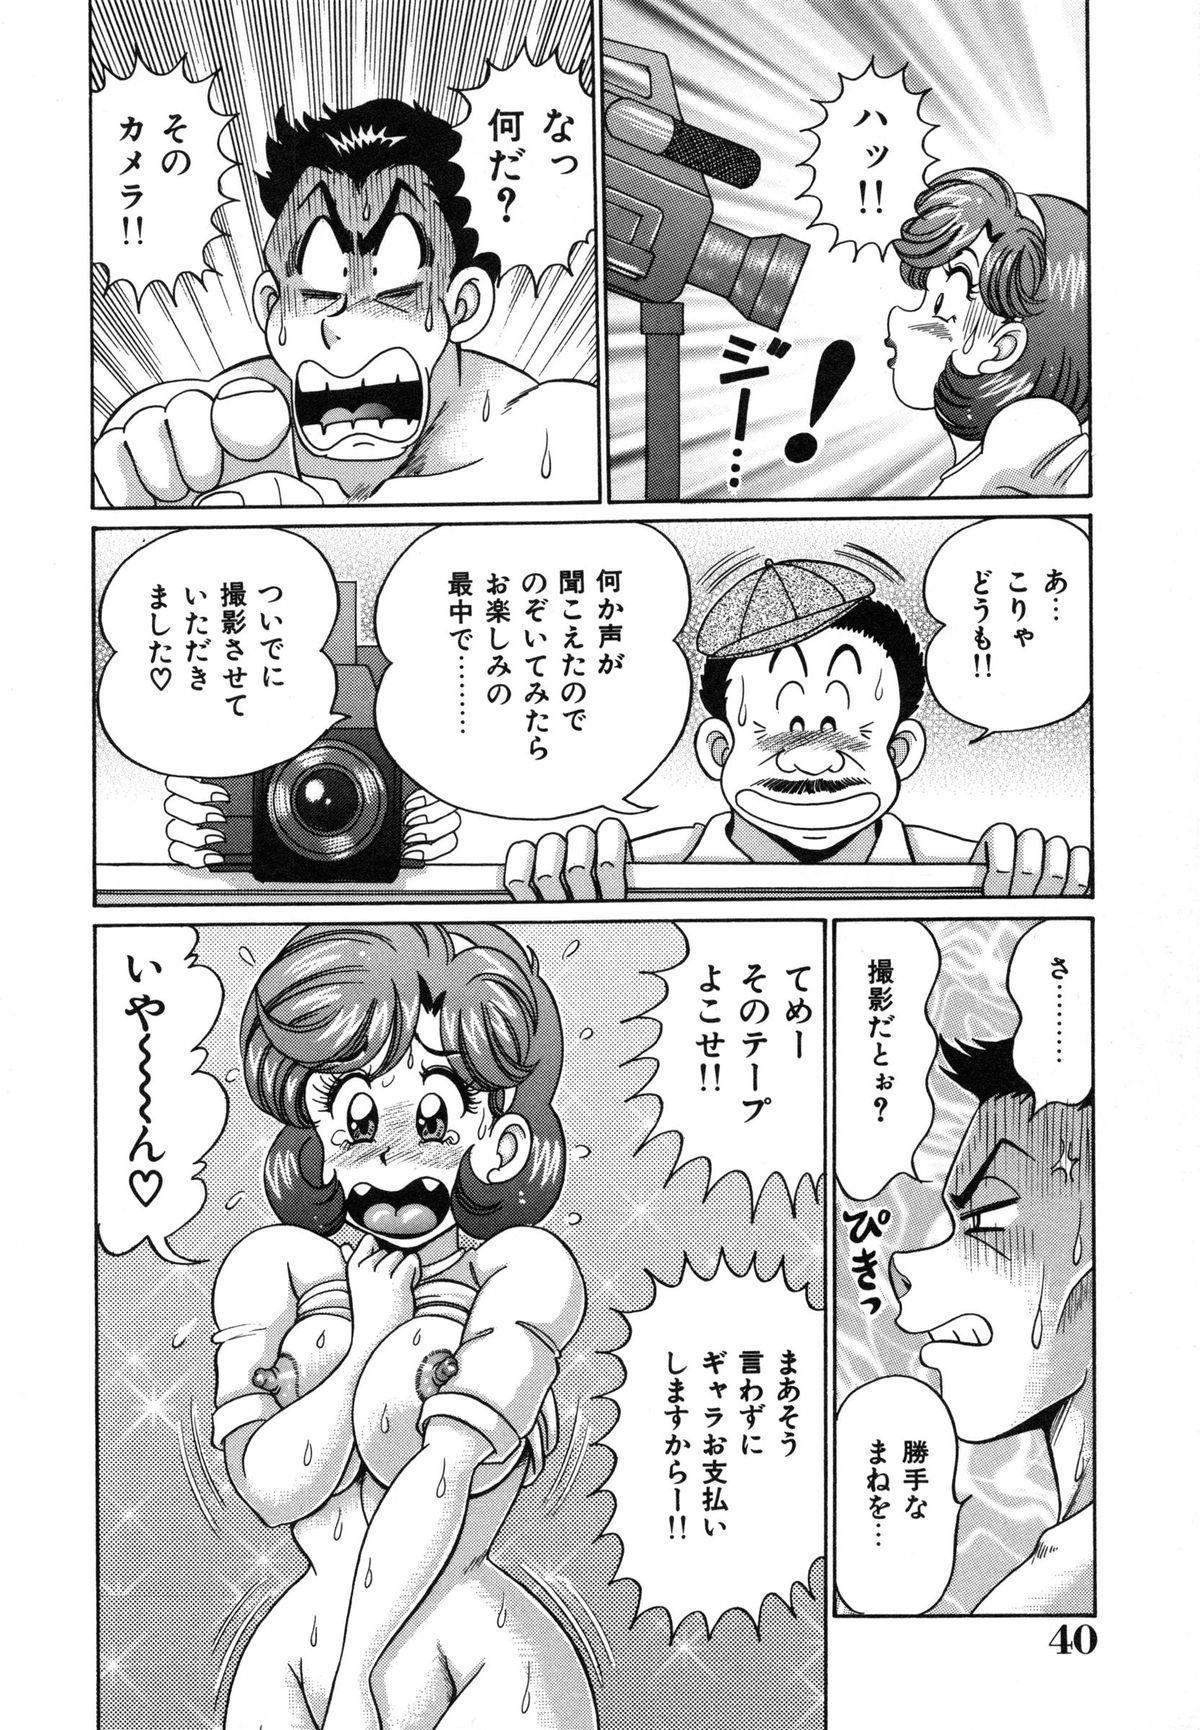 Anoko wa F-Cup 42